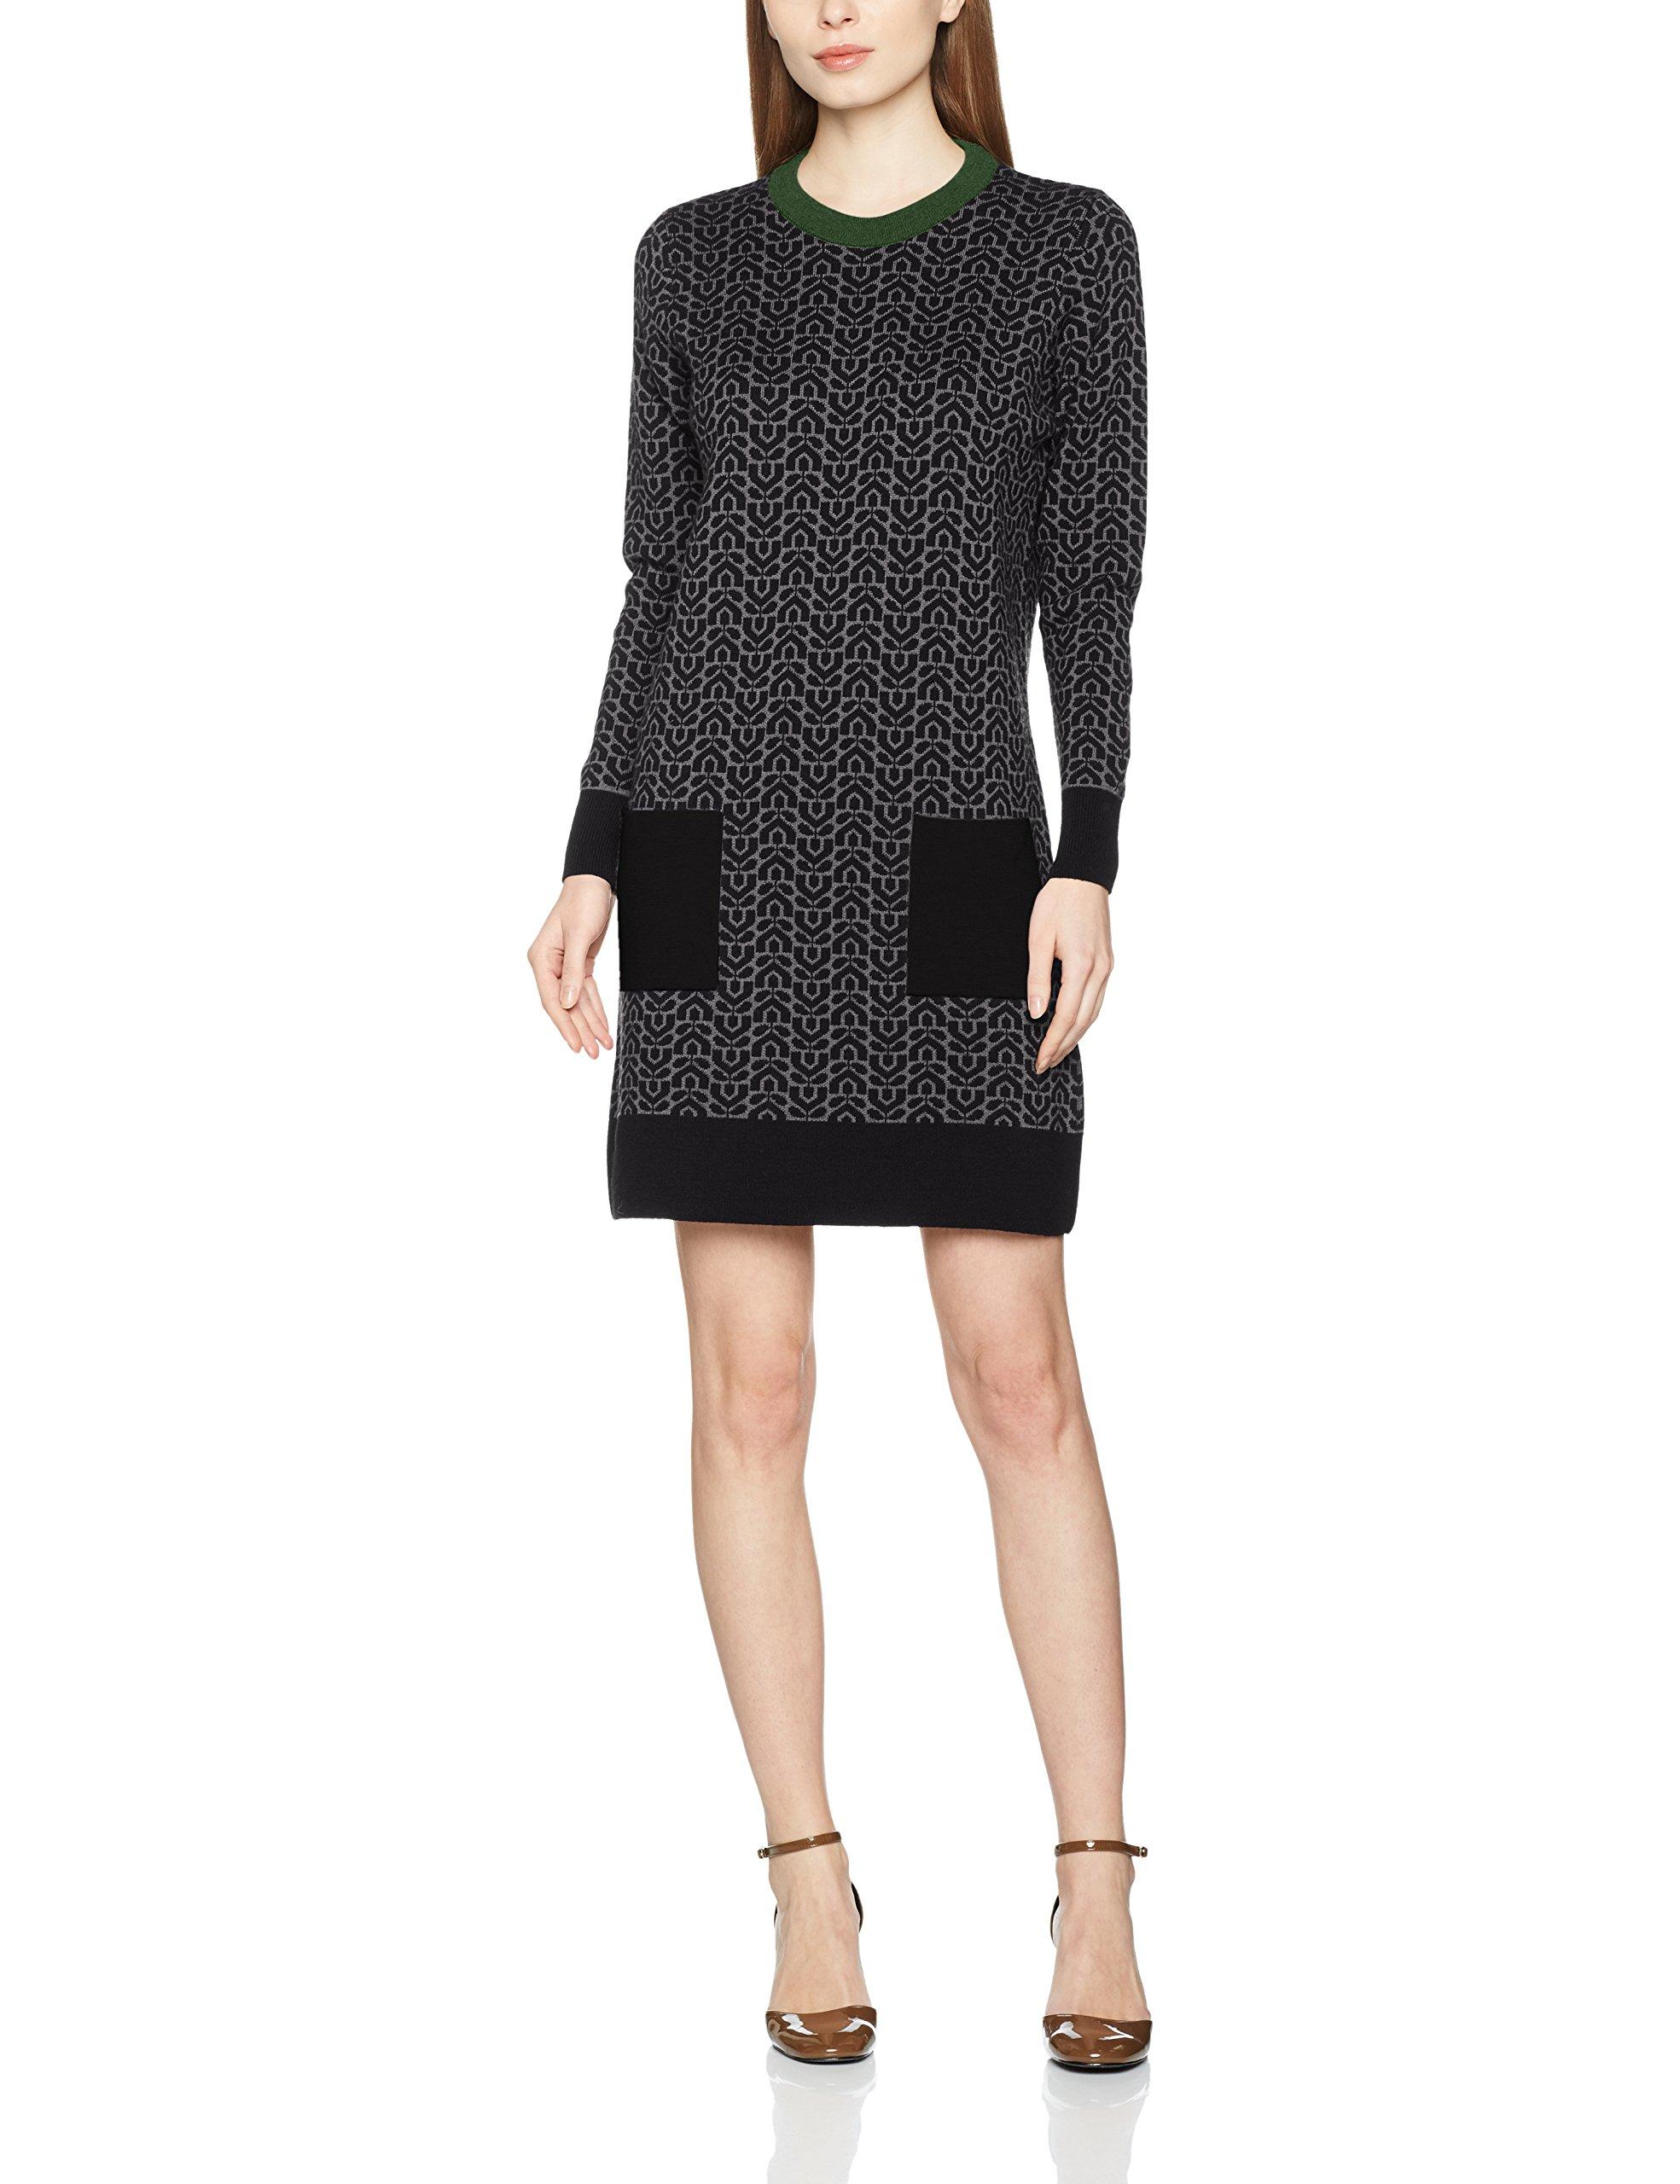 Sweater RobeGrisgrey Black Orla Fabricant Kiely Dress 002540taille largeFemme uKcT1J3lF